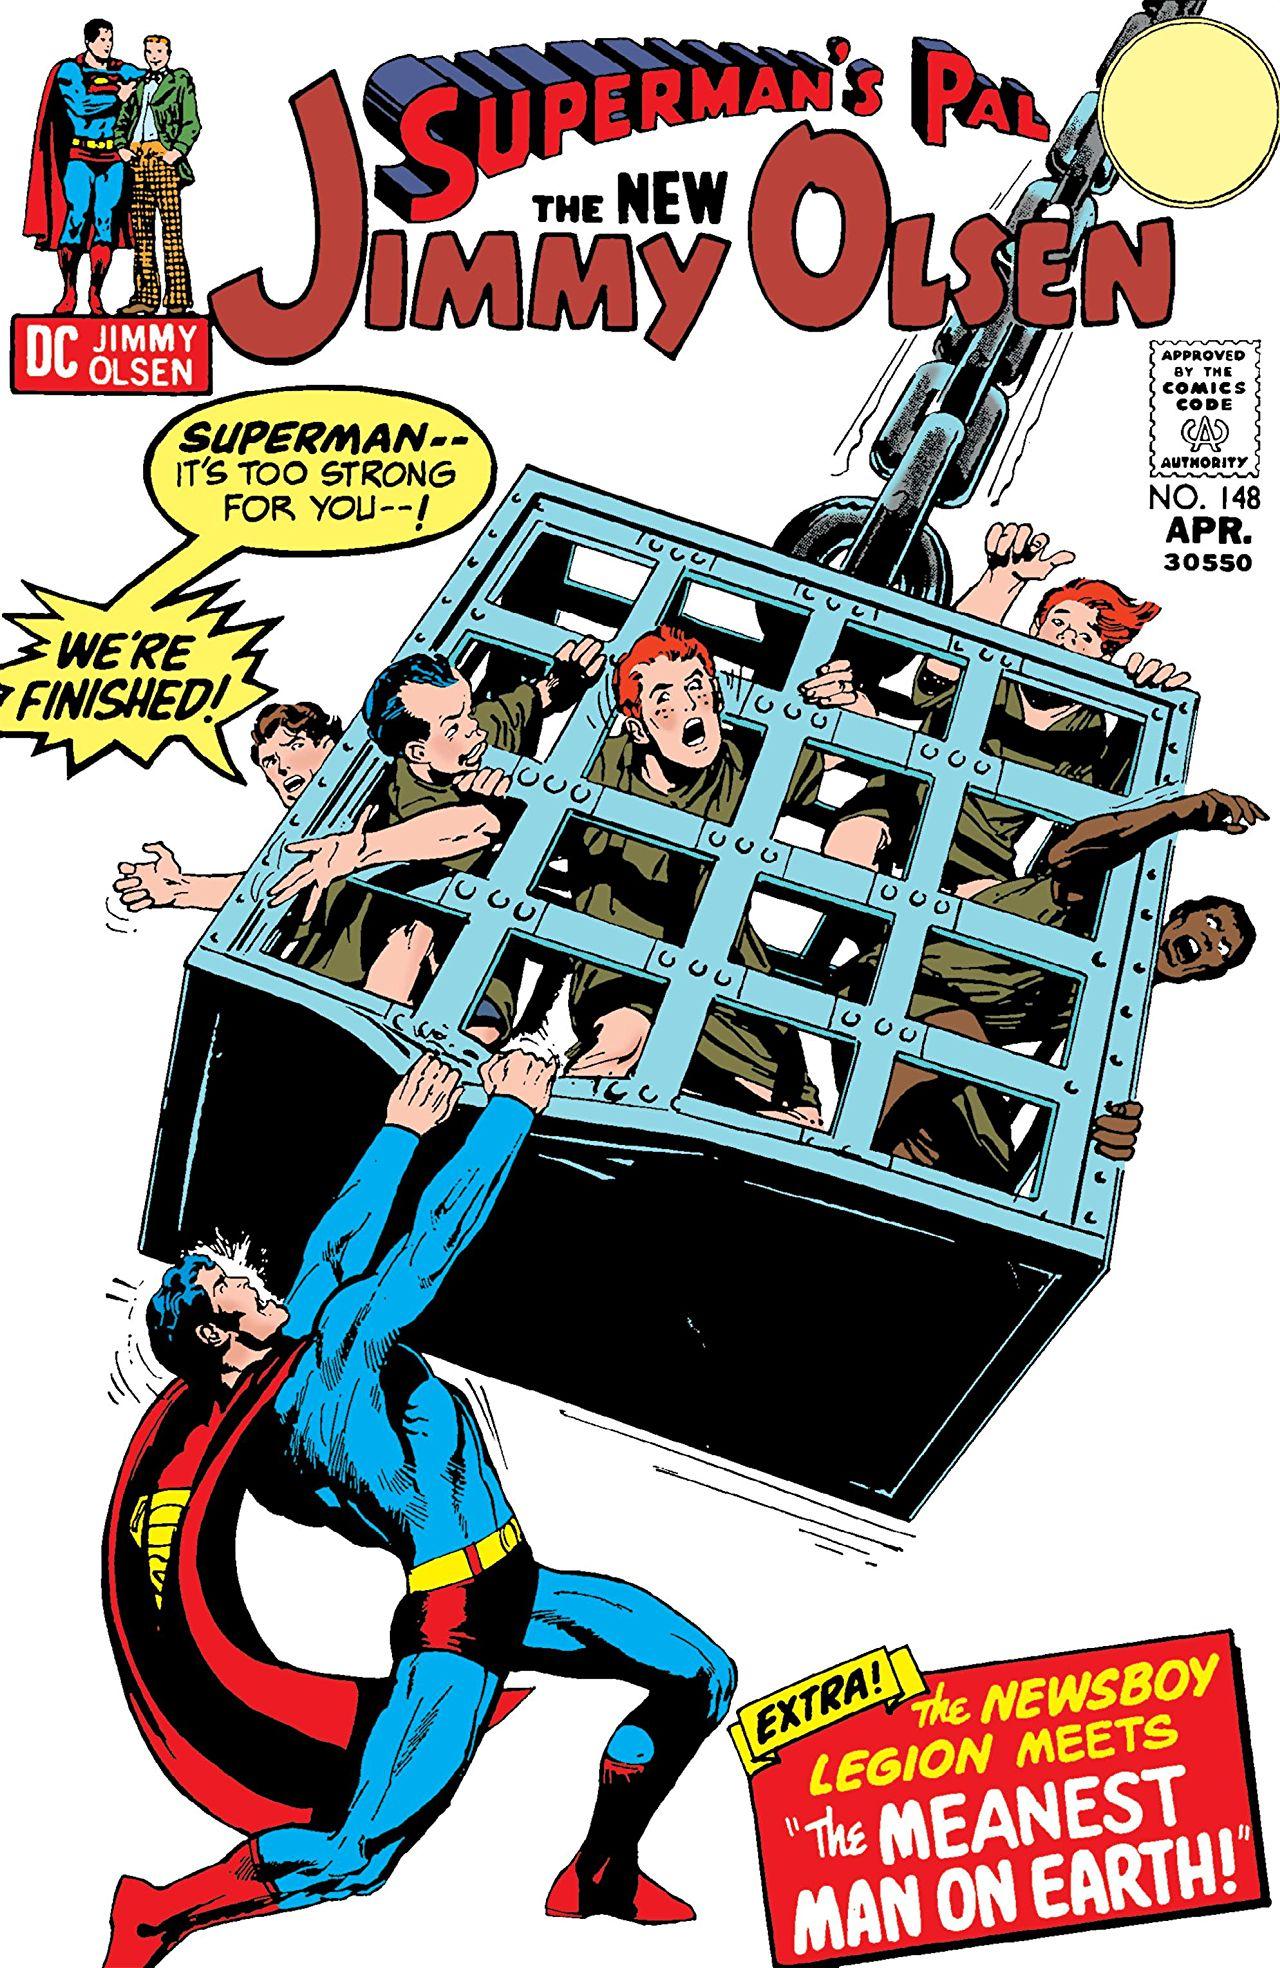 Comic Superman discount offer